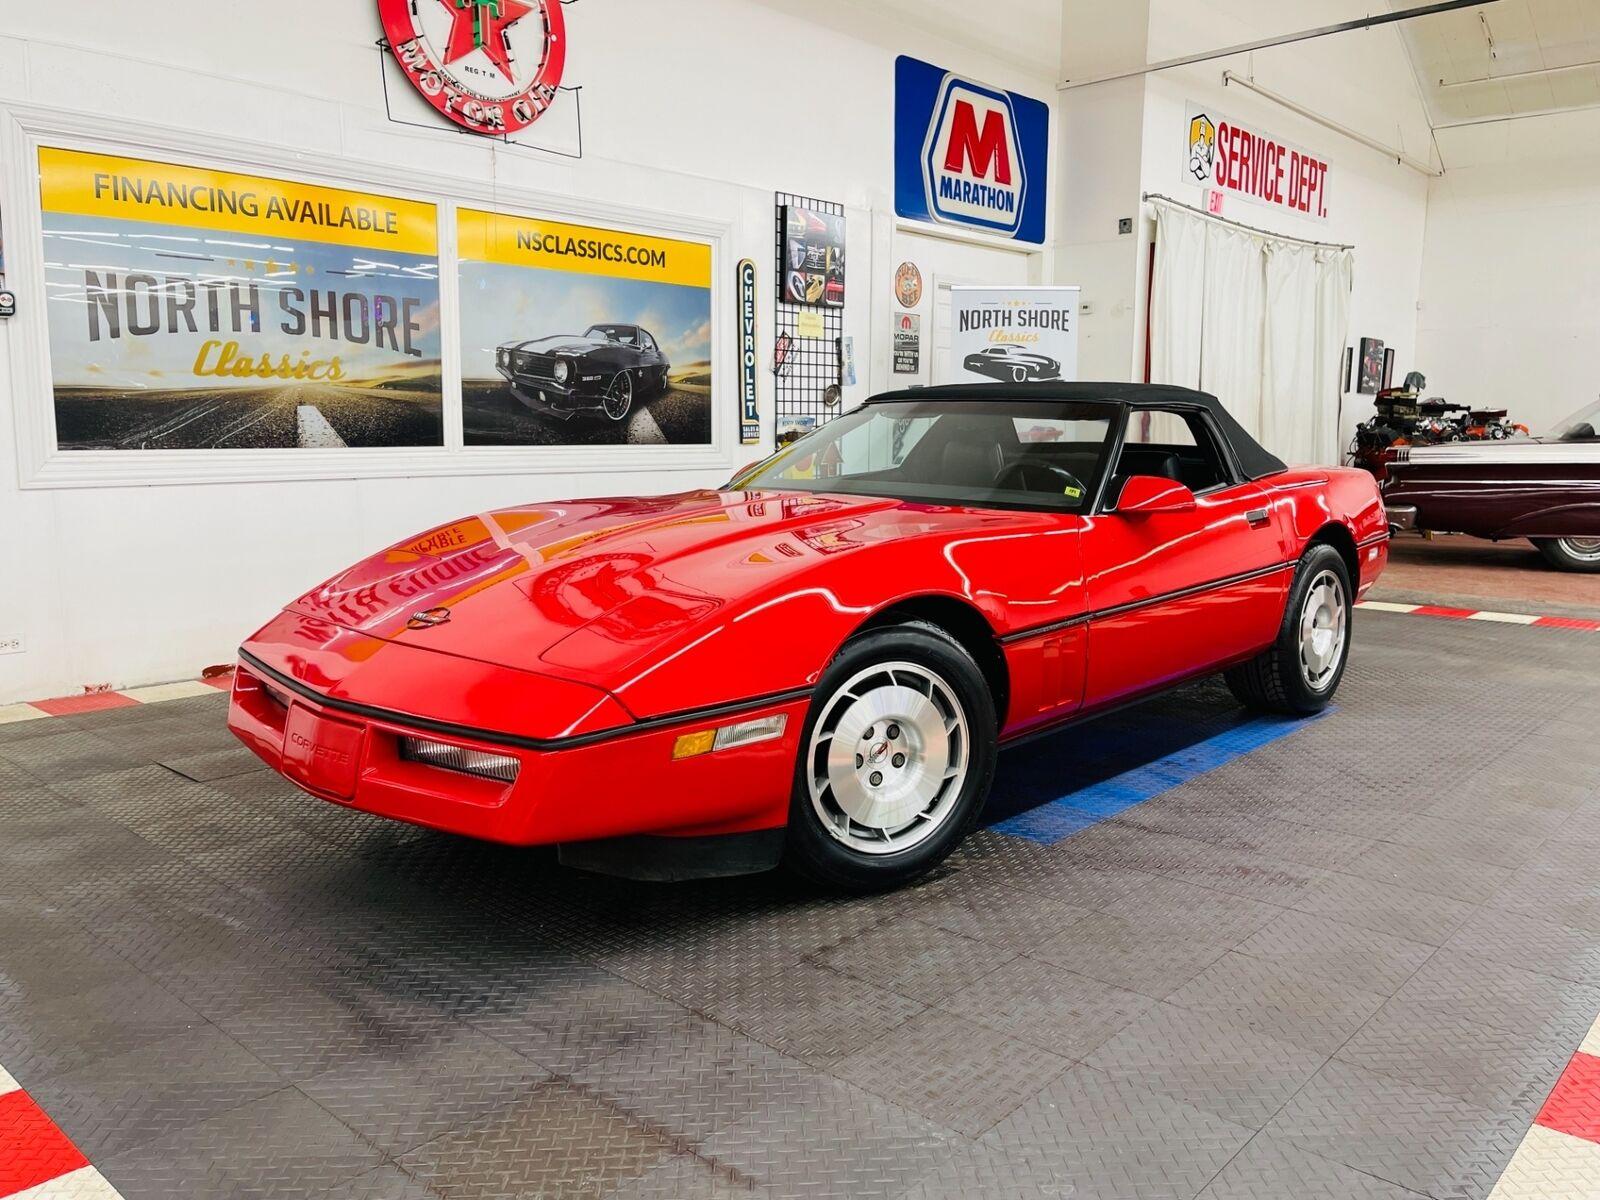 1986 Red Chevrolet Corvette Convertible  | C4 Corvette Photo 4